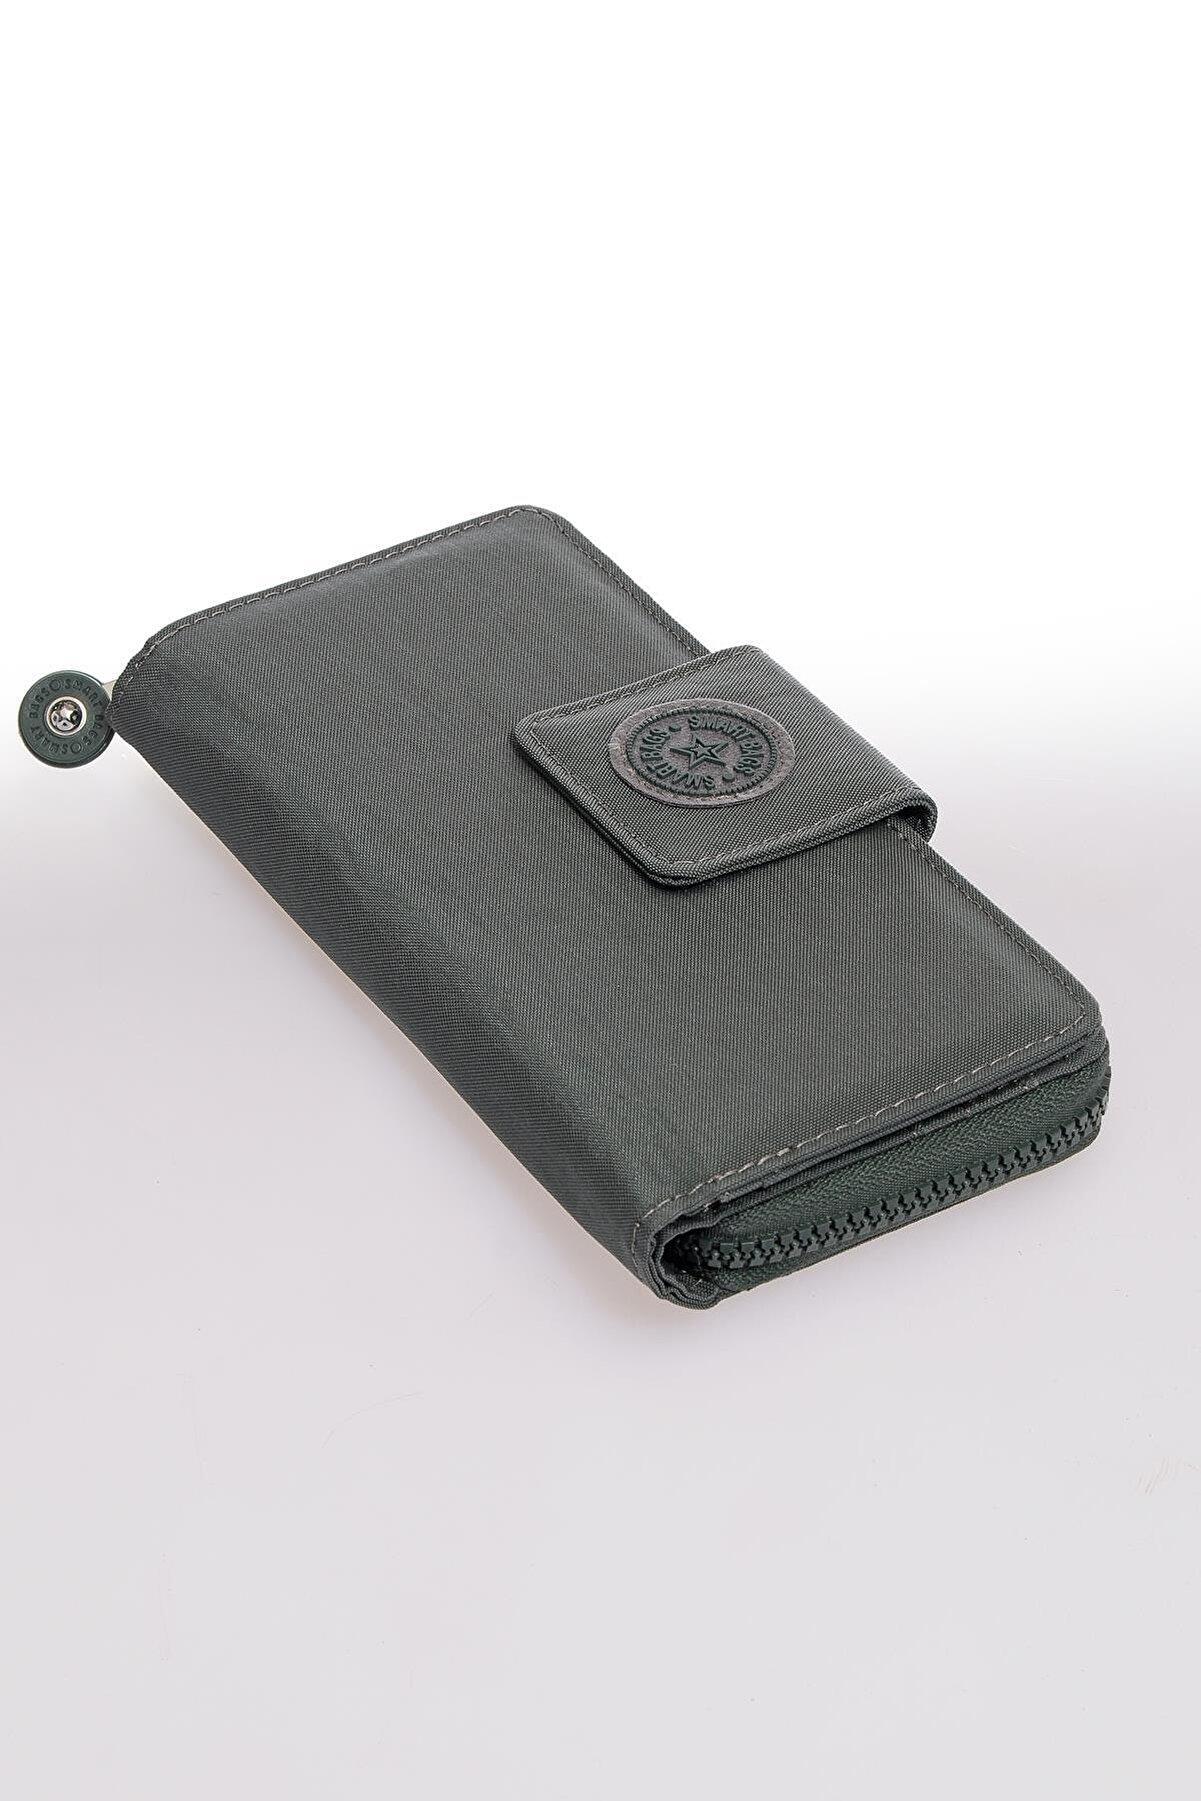 Smart Bags Smb3034-0005 Haki Kadın Cüzdan